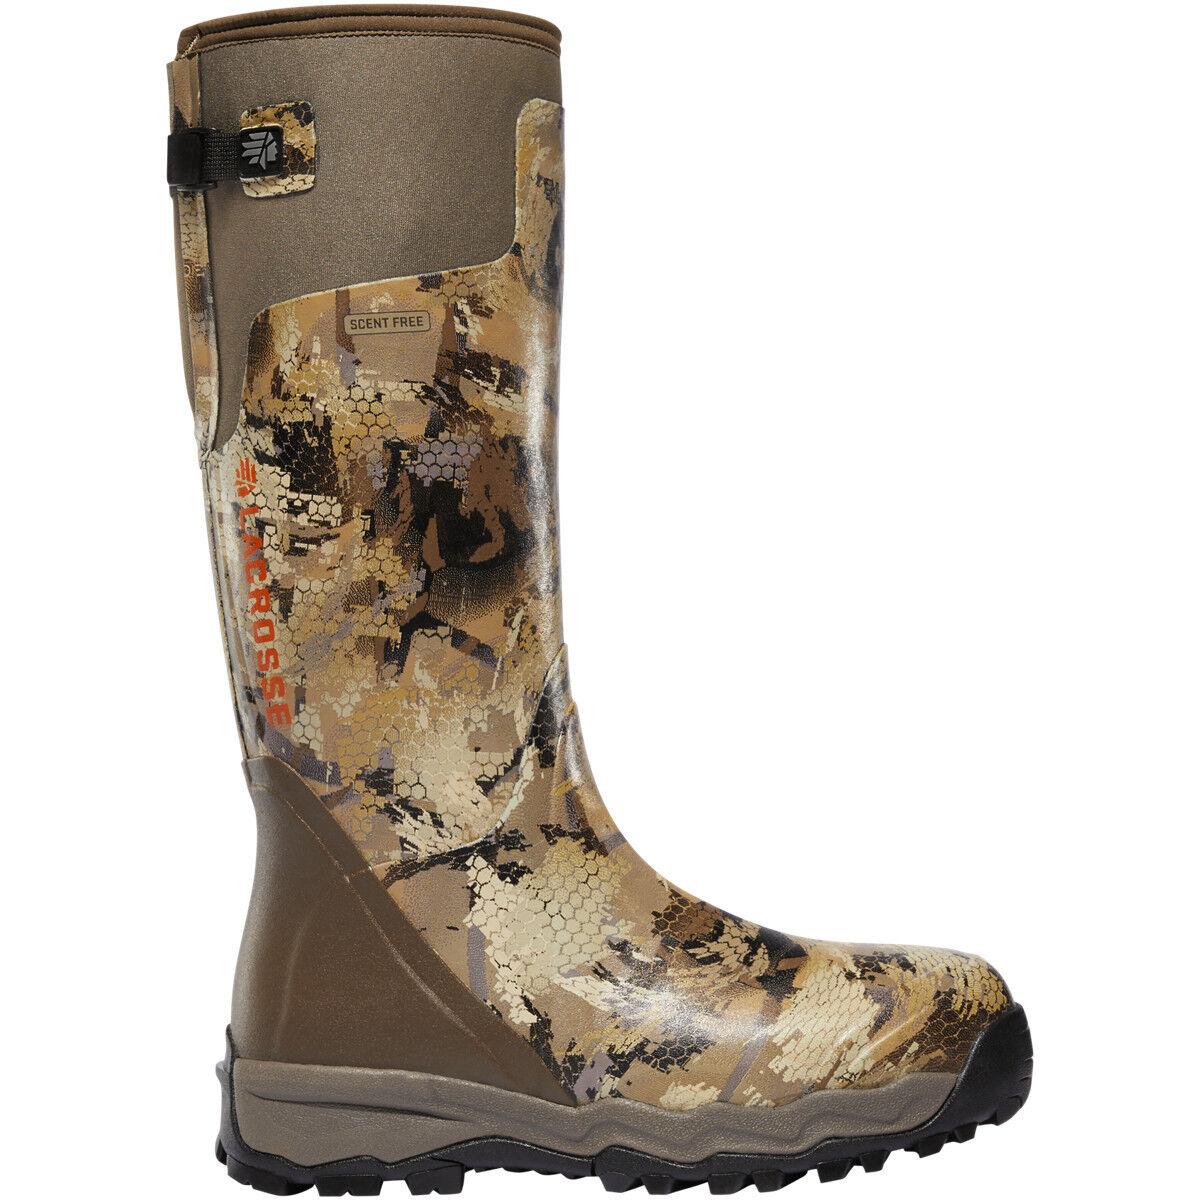 Lacrosse Men's 376010 Alphaburly Pro 18  Optifade Marsh Hunting shoes Boots